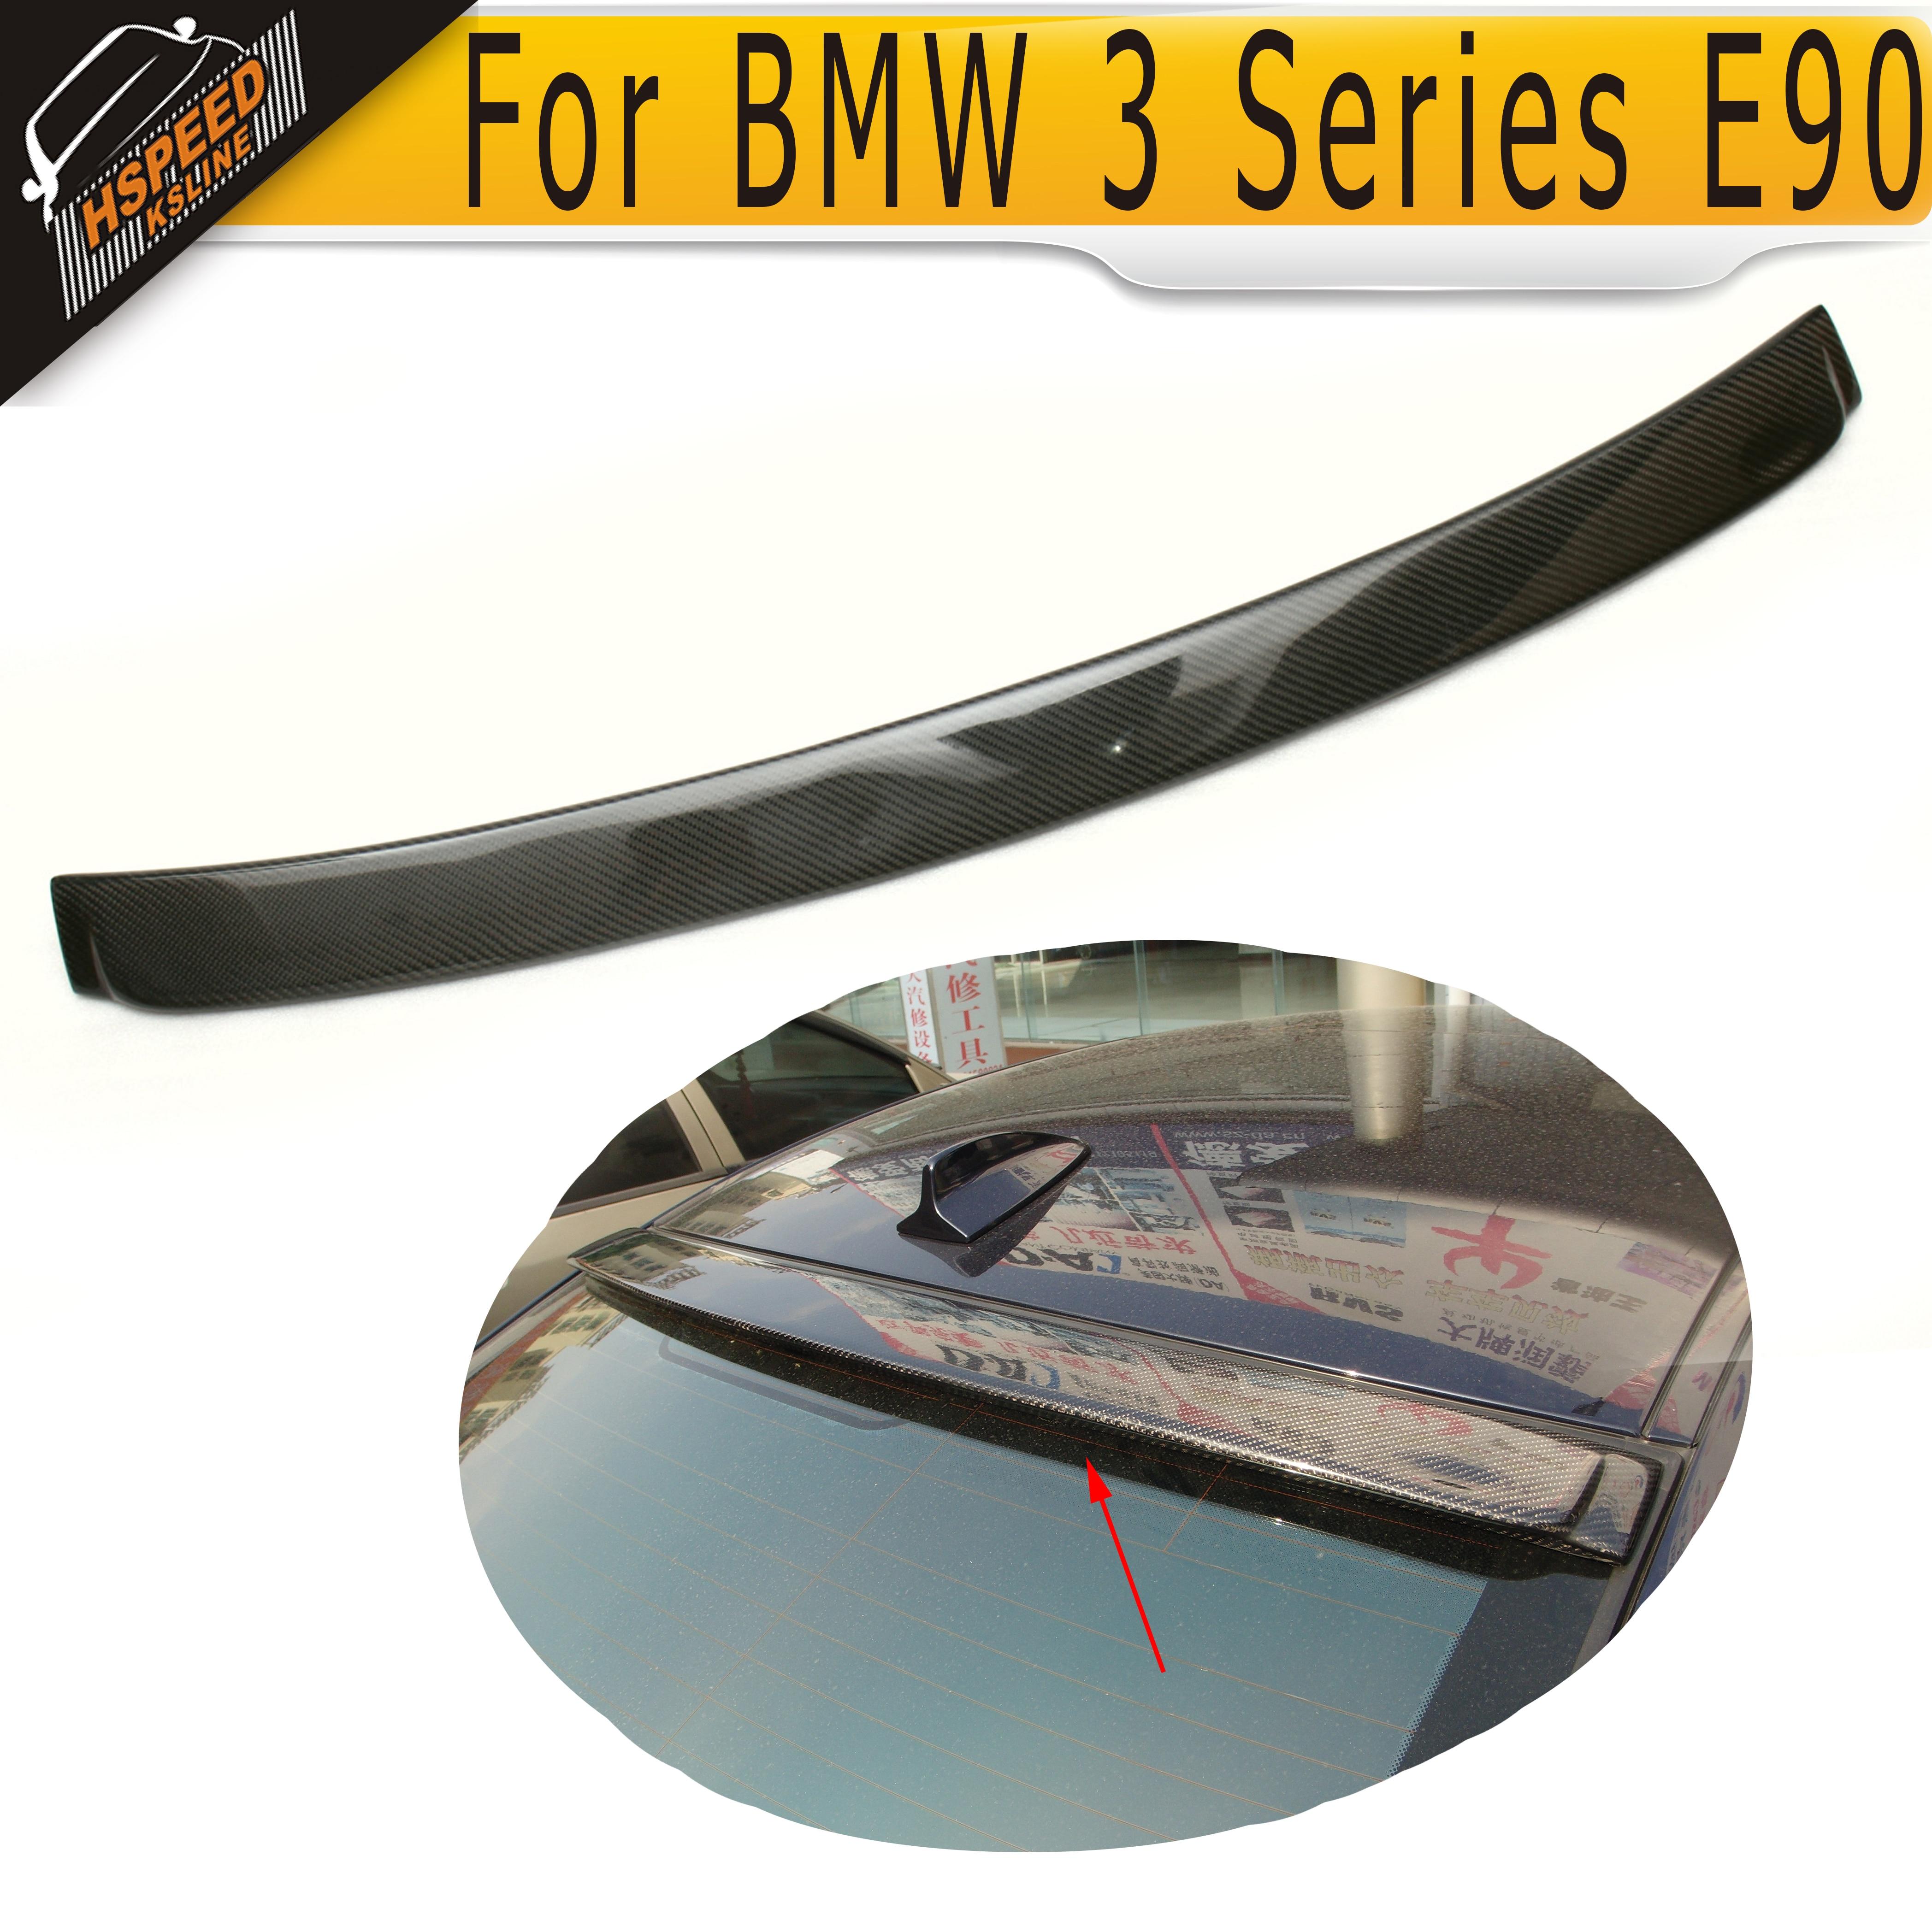 E90 Carbon Fiber car roof lip spoiler for BMW 3 Series E90 2005 2006 2007 2008 AC style<br><br>Aliexpress